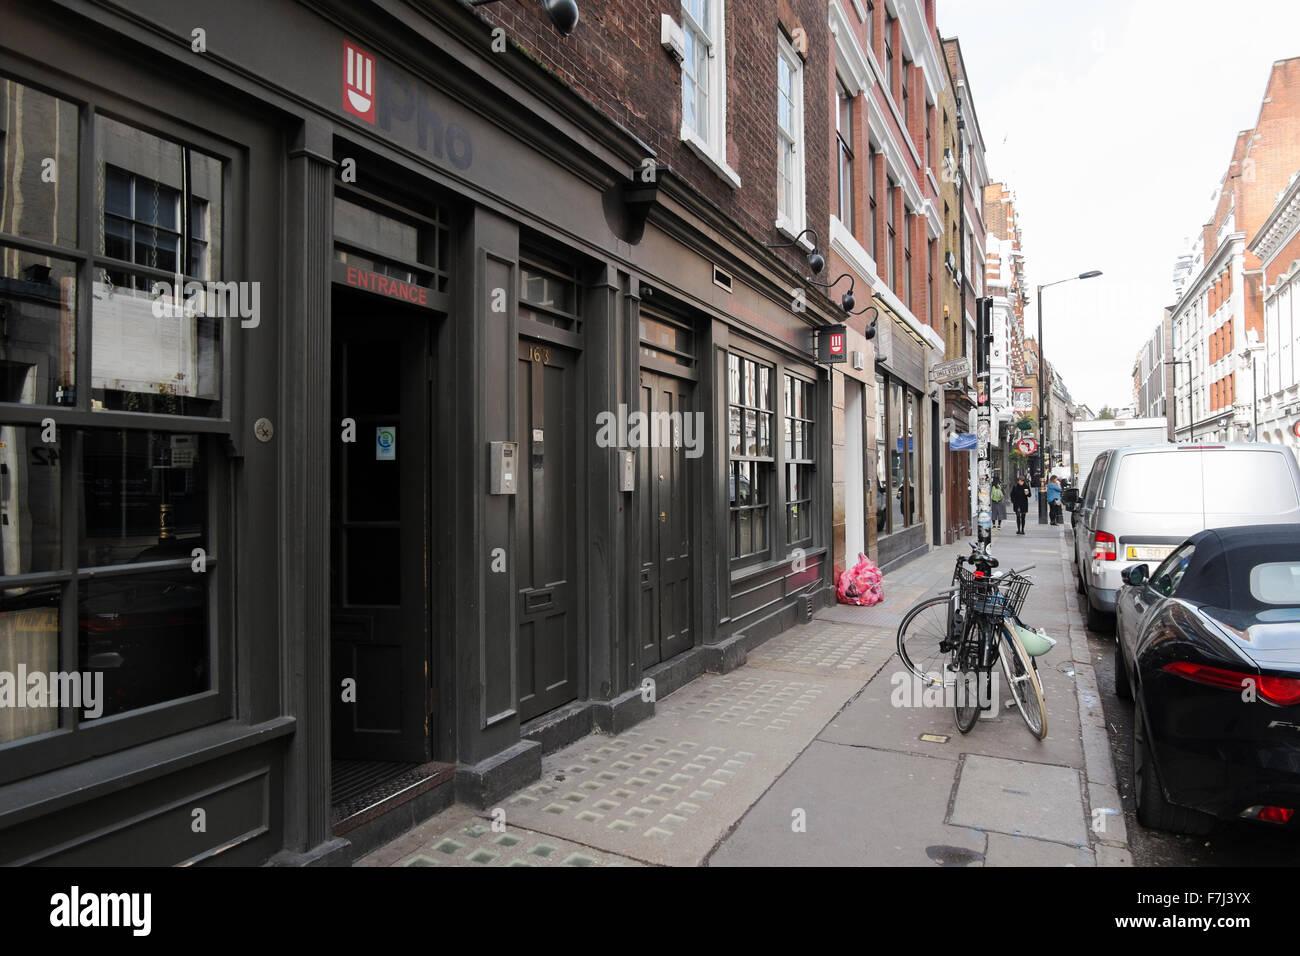 Stock Photo - Pho Vietnamese street food restaurant in Wardour Street, Soho,London, England, UK